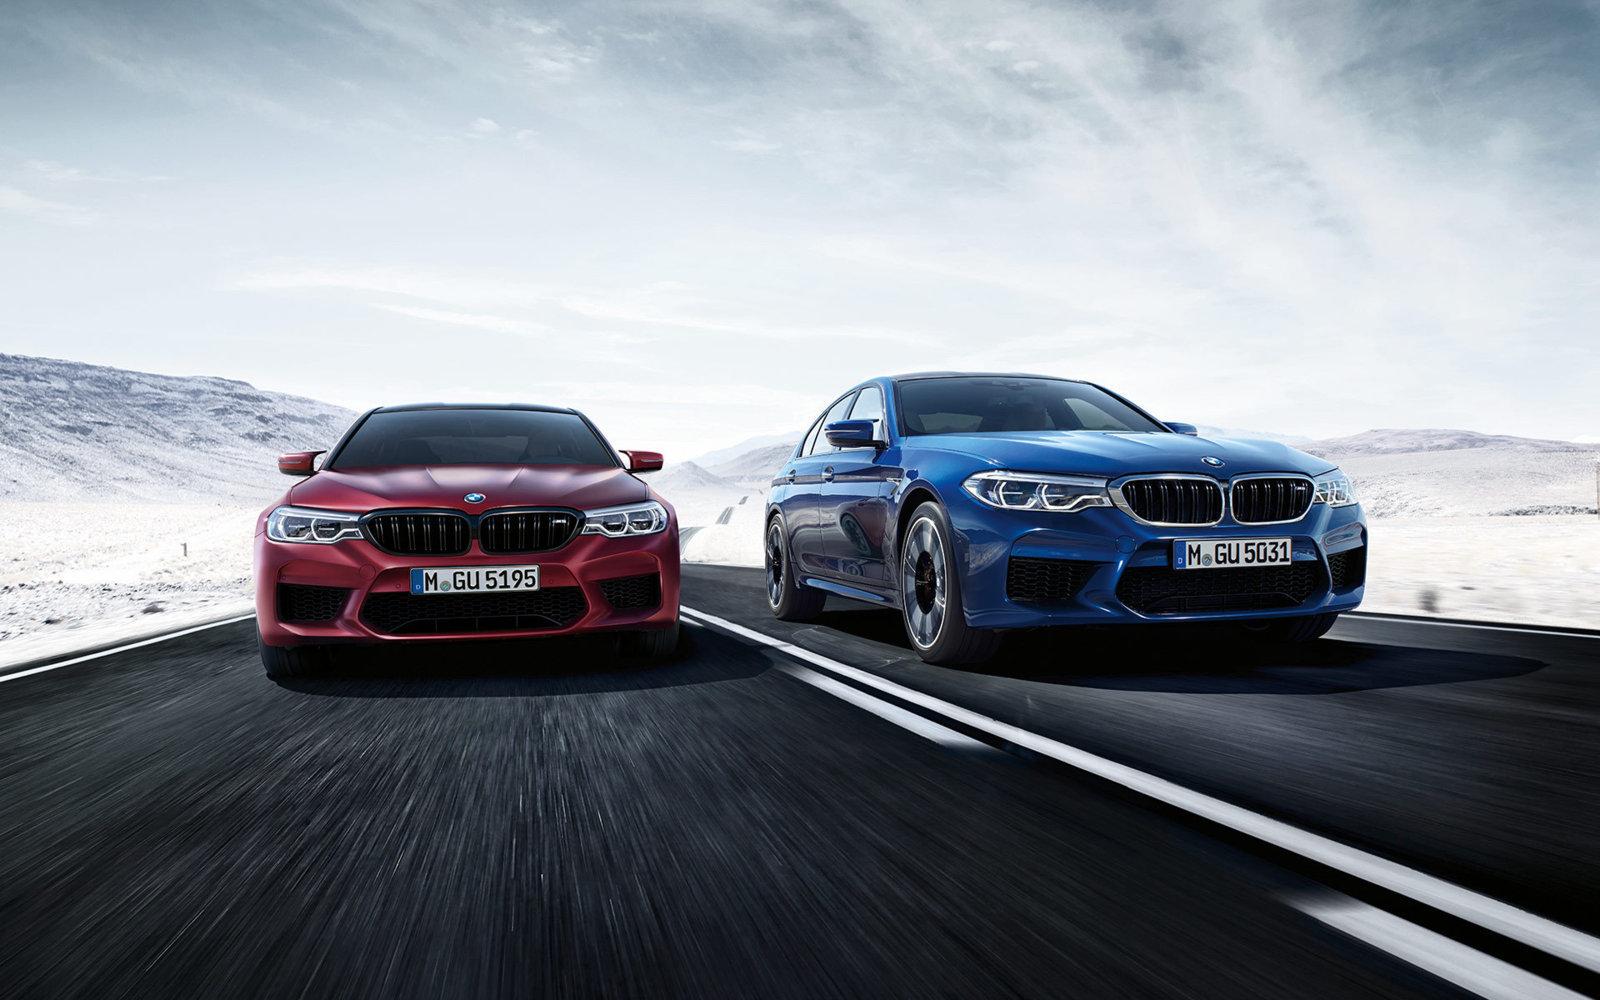 BMW-M5-2018-Wallpaper-1.jpg